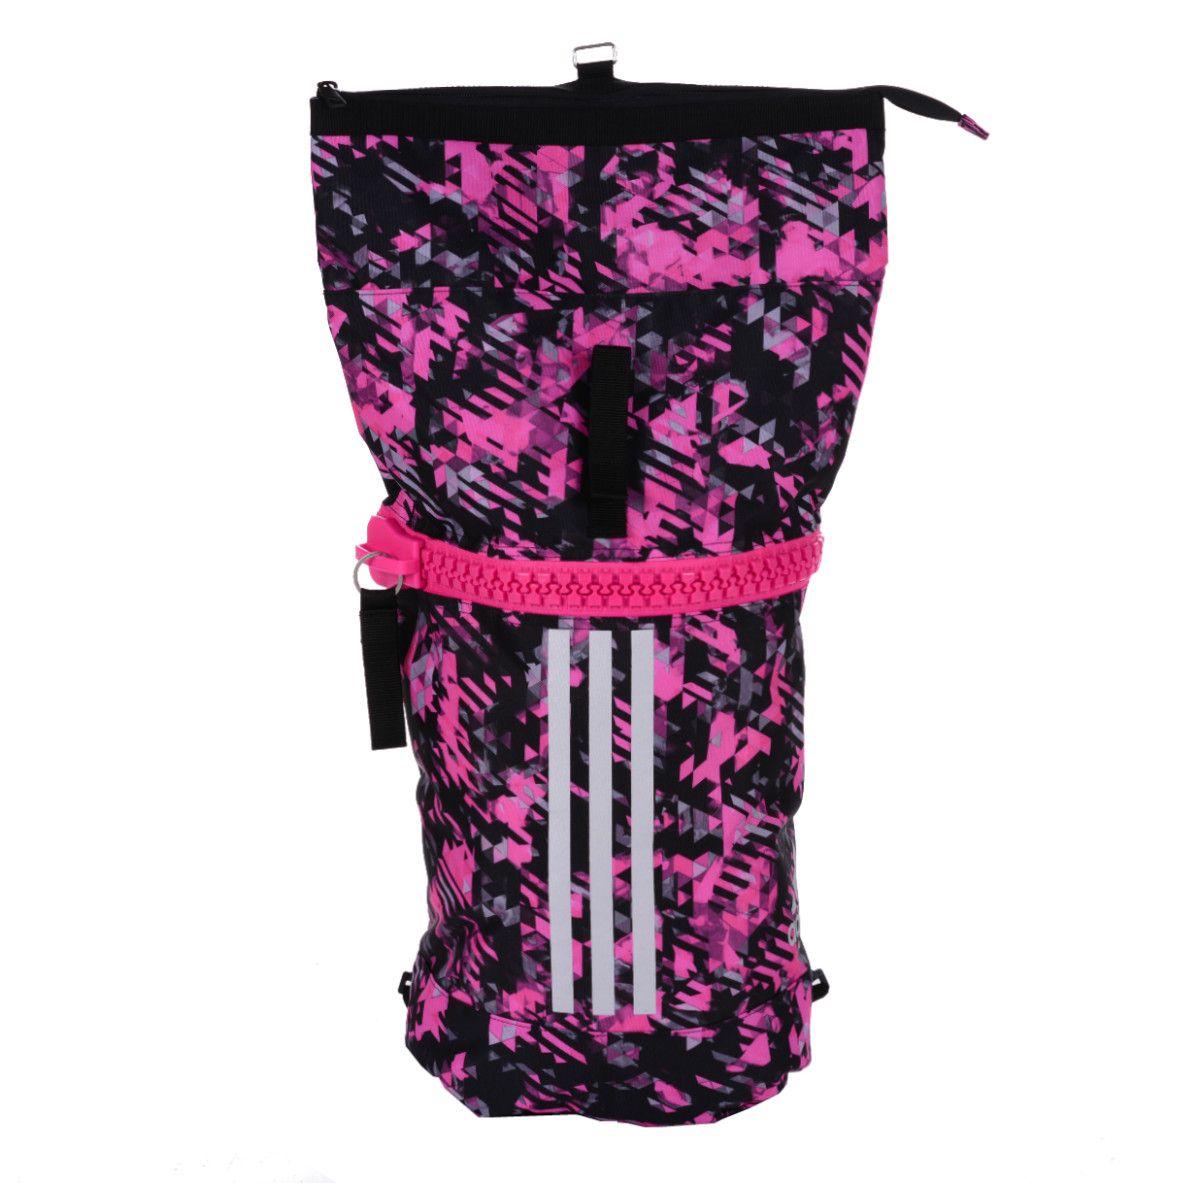 Mochila Adidas Karate Camuflada Rosa - 25 Litros